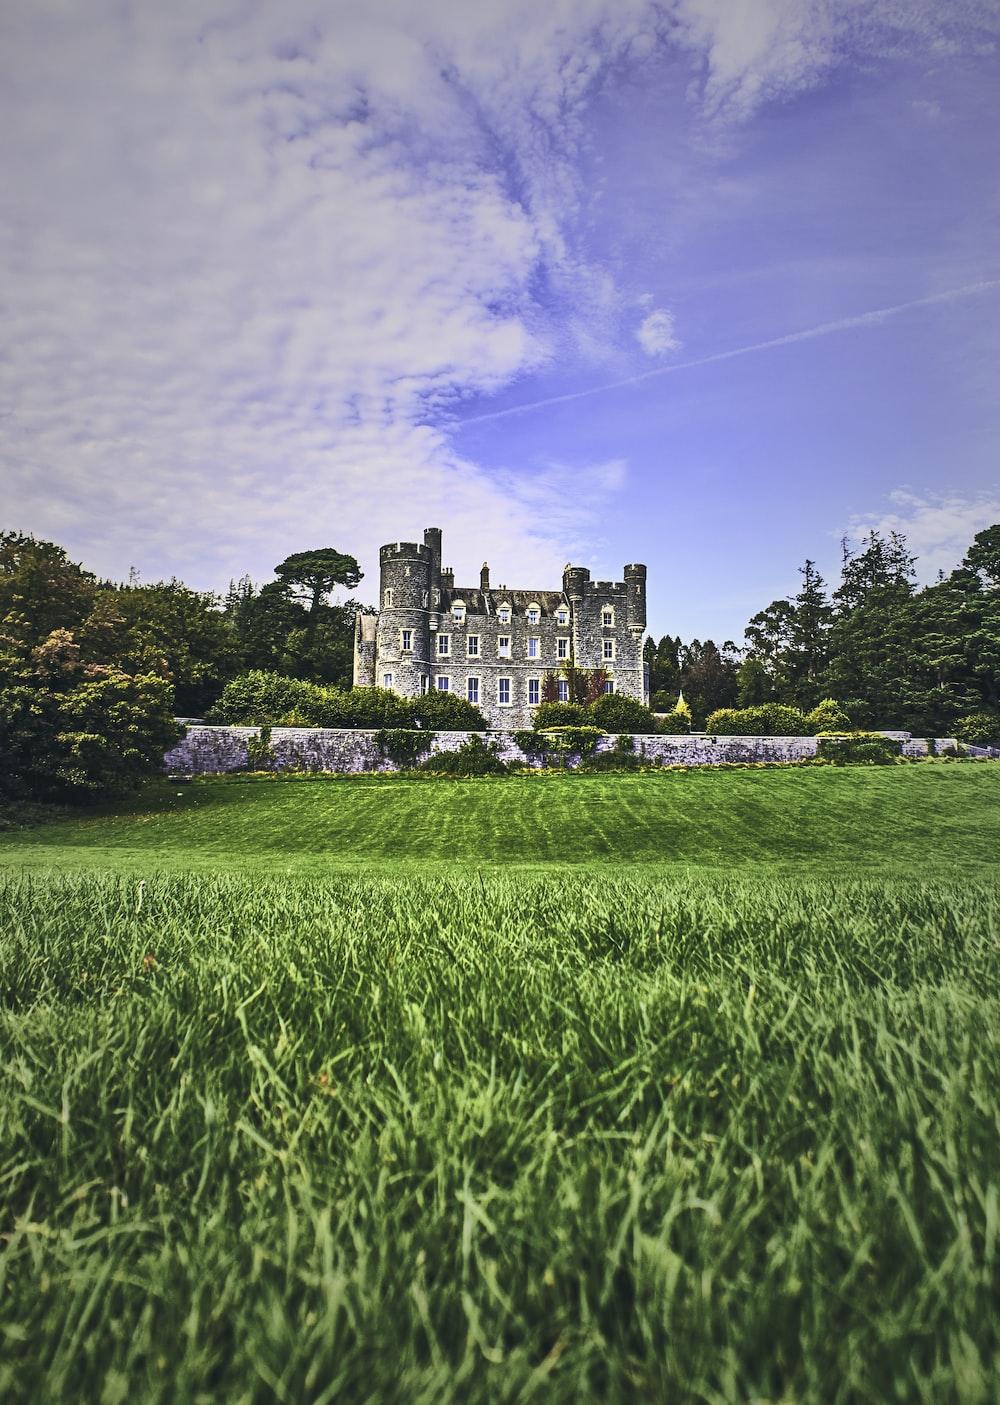 green grass field near castle under blue sky during daytime